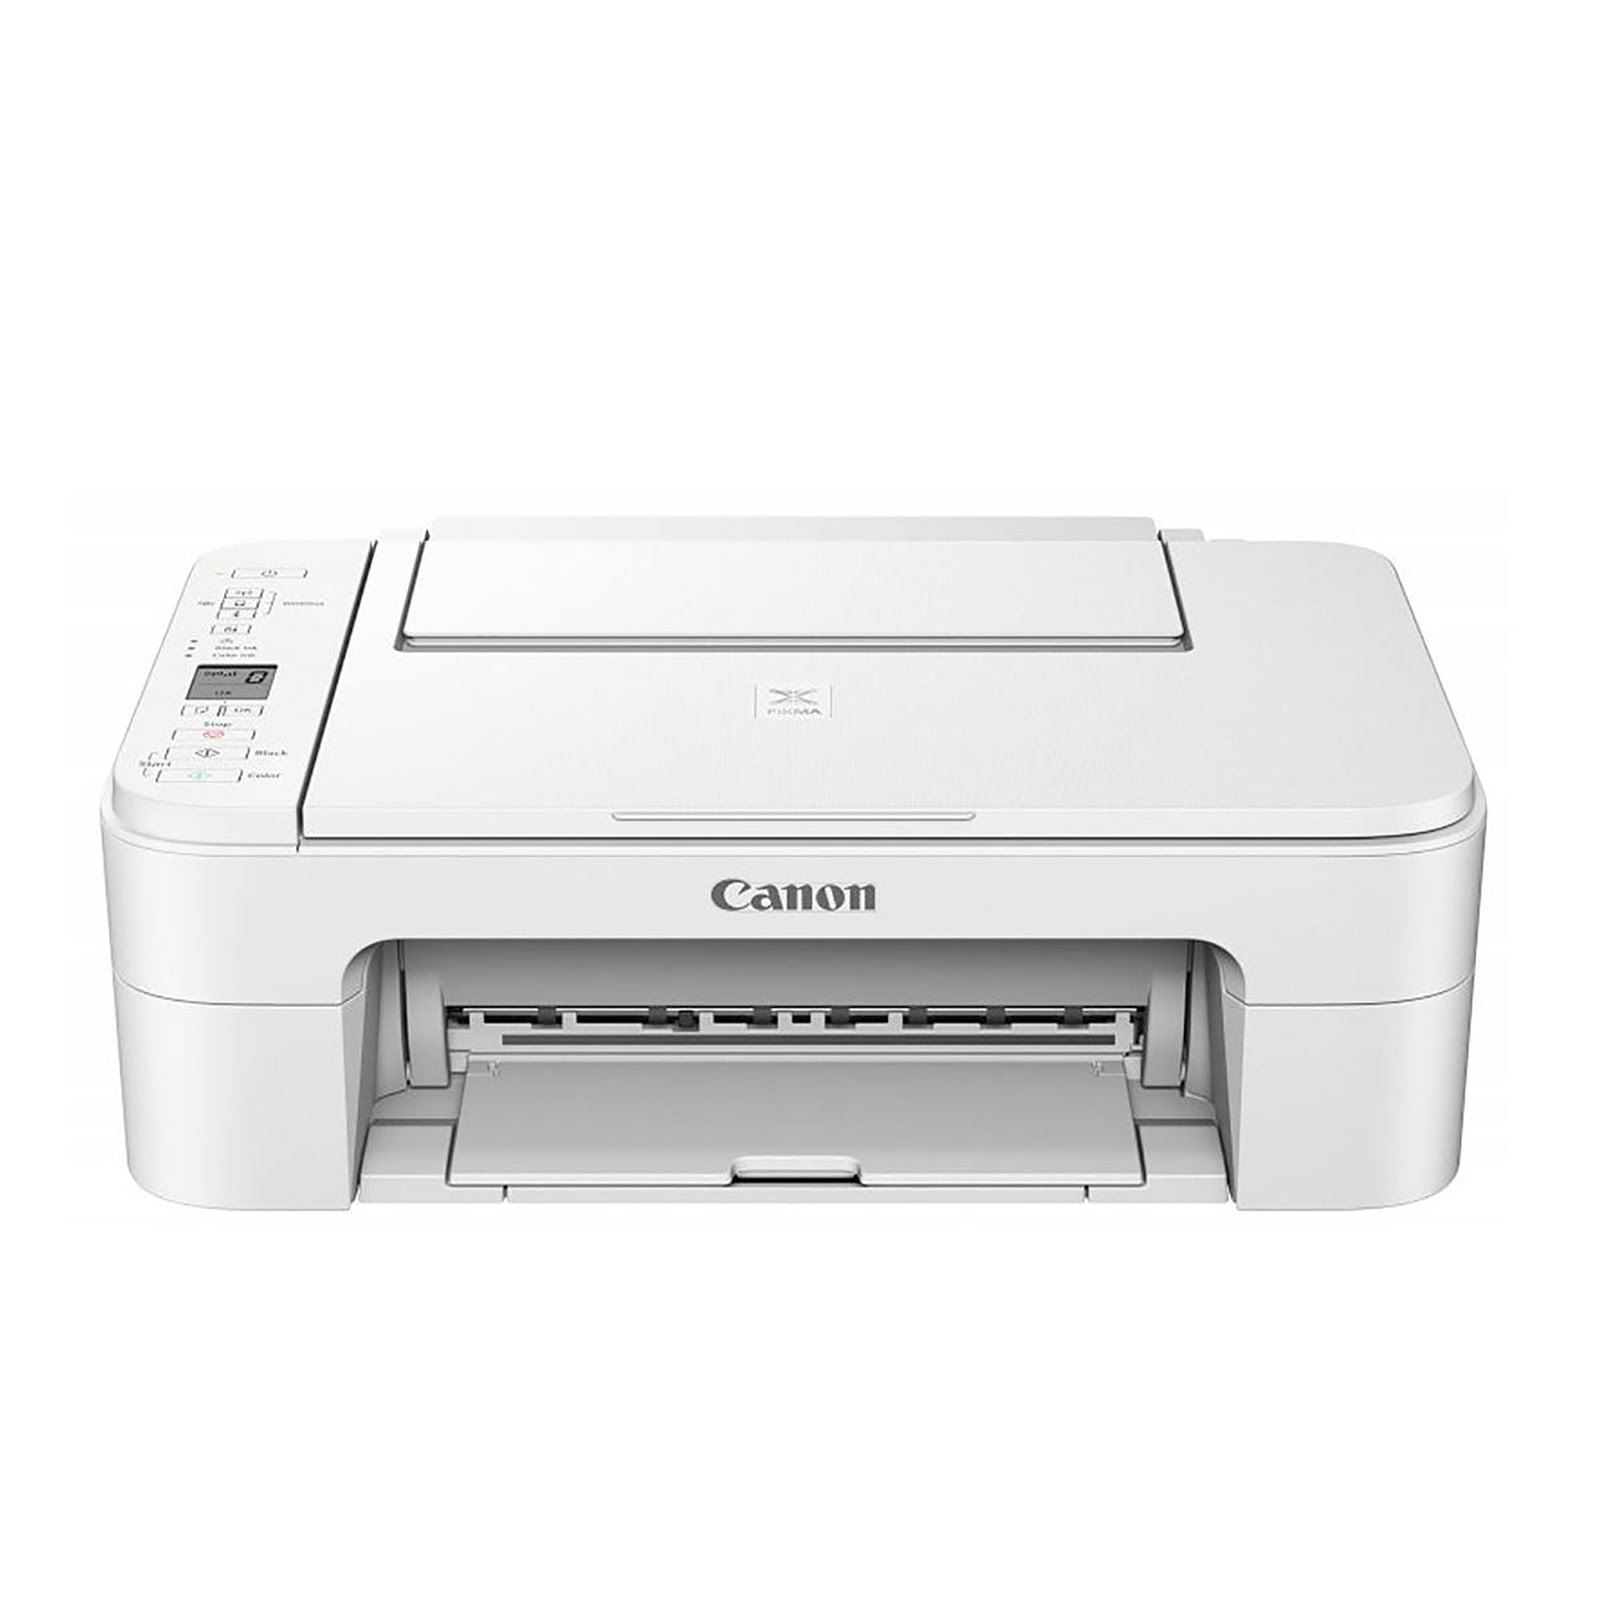 Imprimante multifonction Canon PIXMA TS3351 White - Cybertek.fr - 0